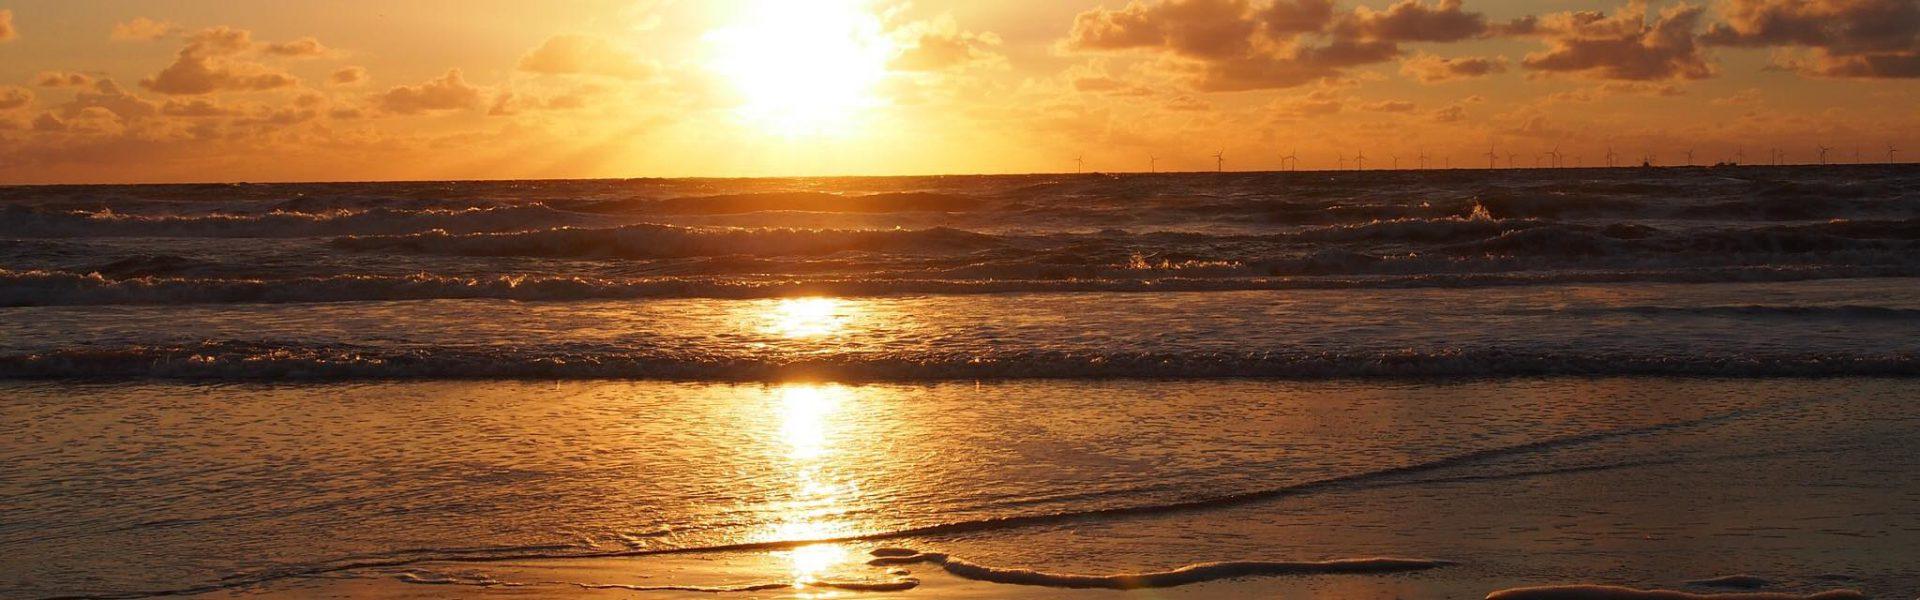 Nautilus sunset